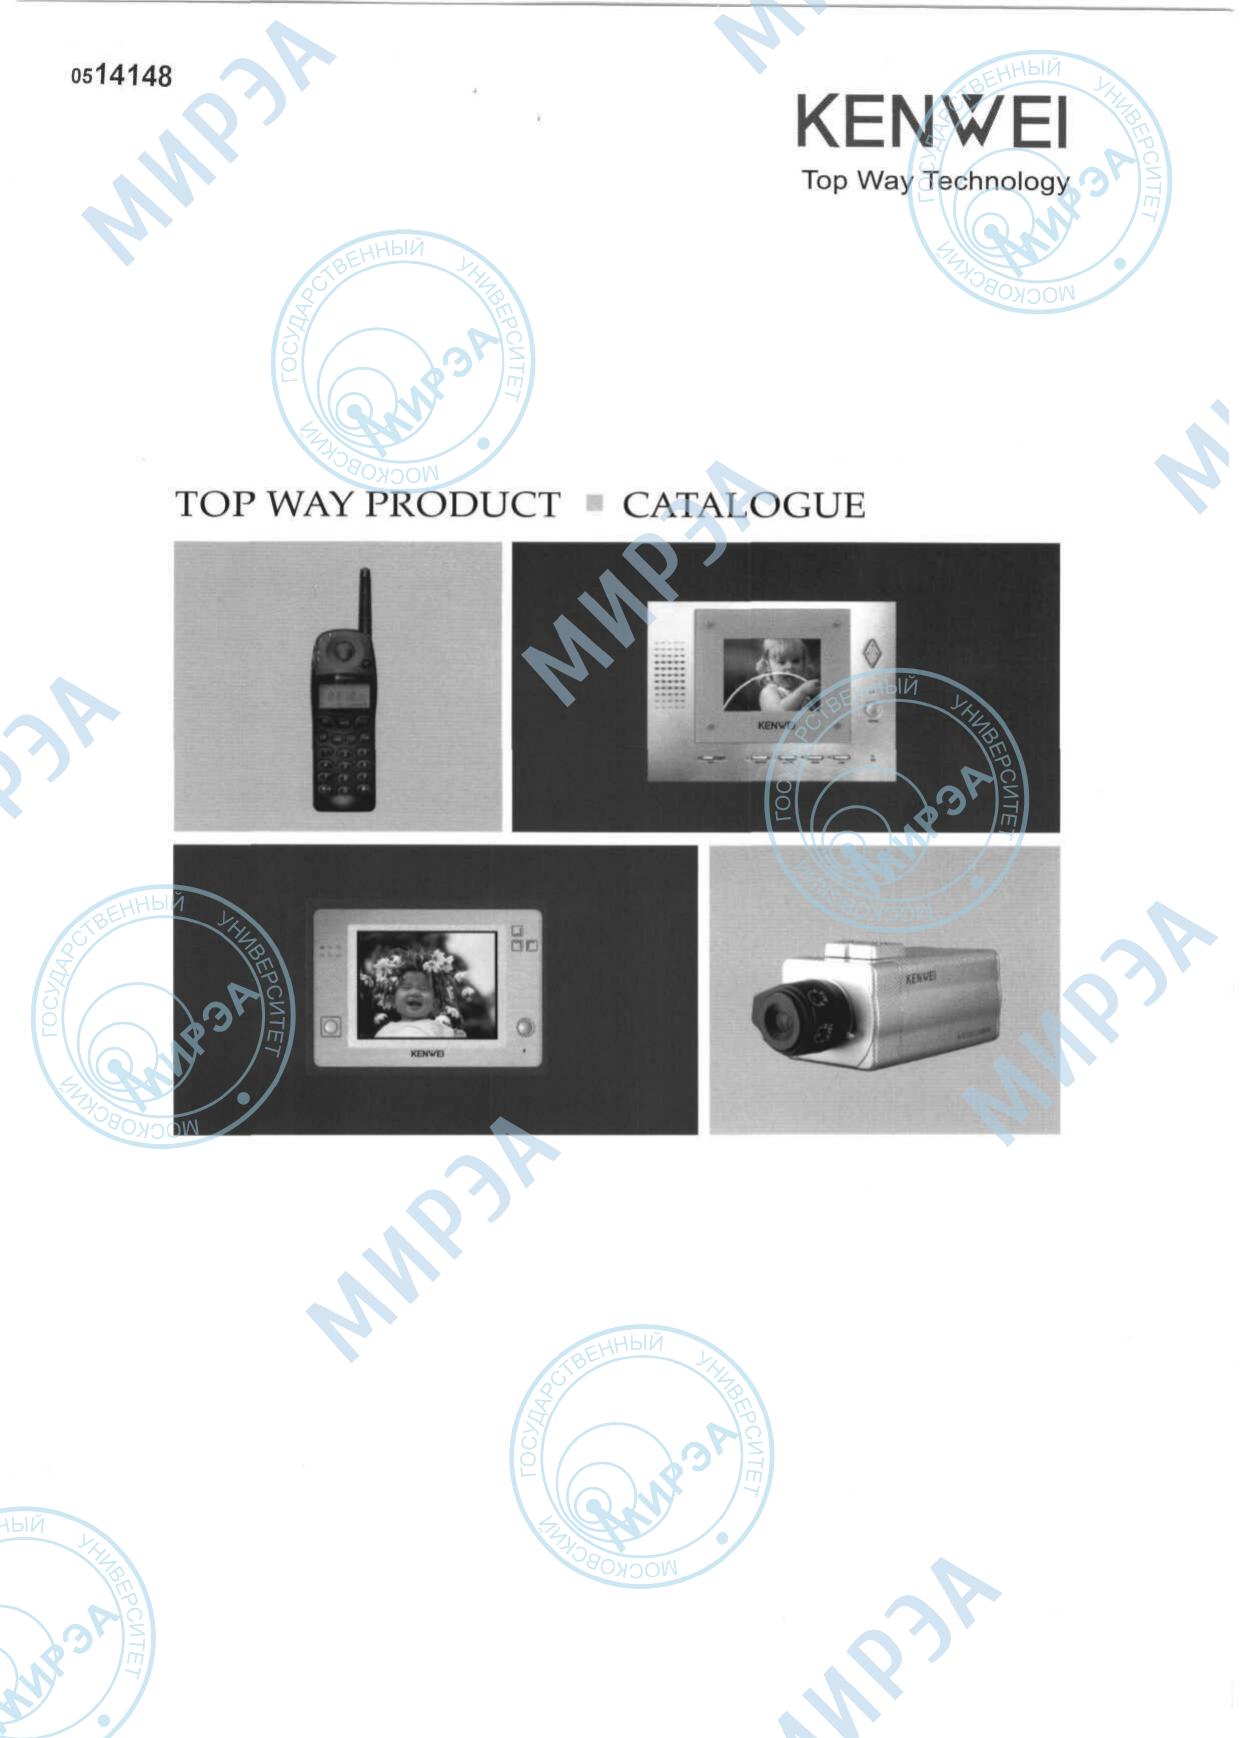 Kenwei Intercom Wiring Diagram on